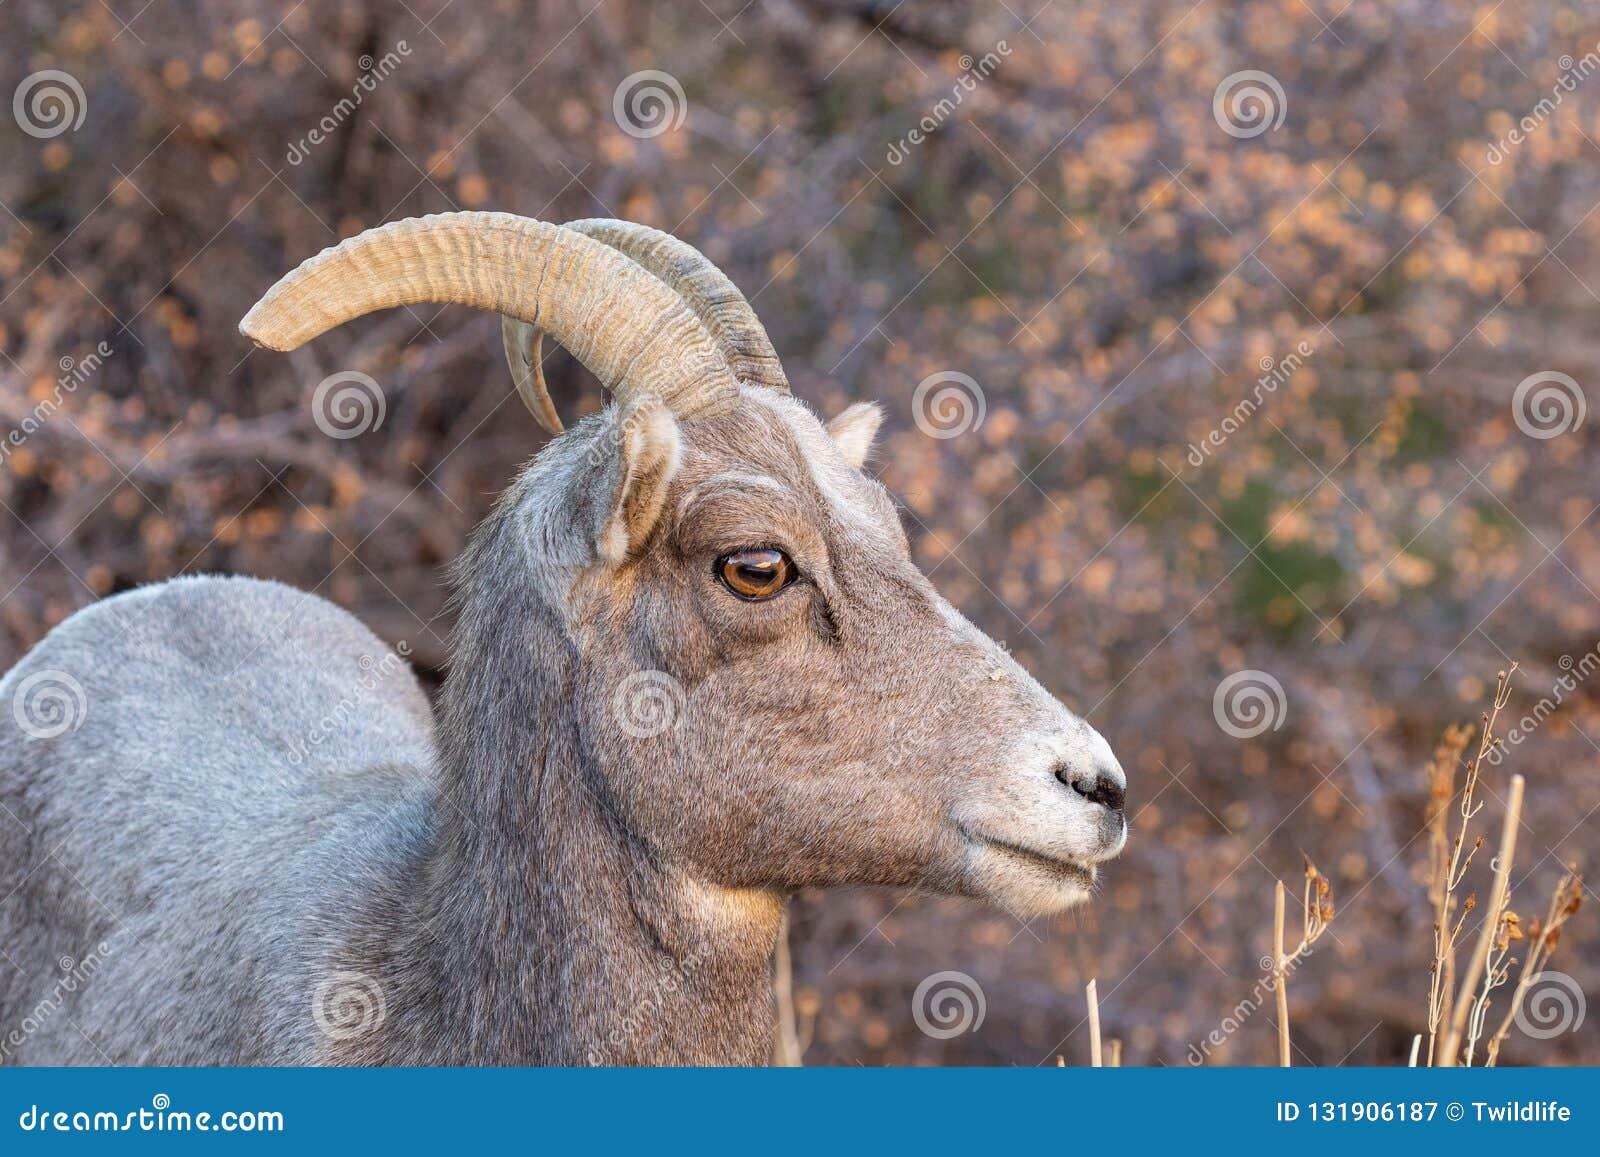 Desert Bighorn Sheep Ewe Side Portrait